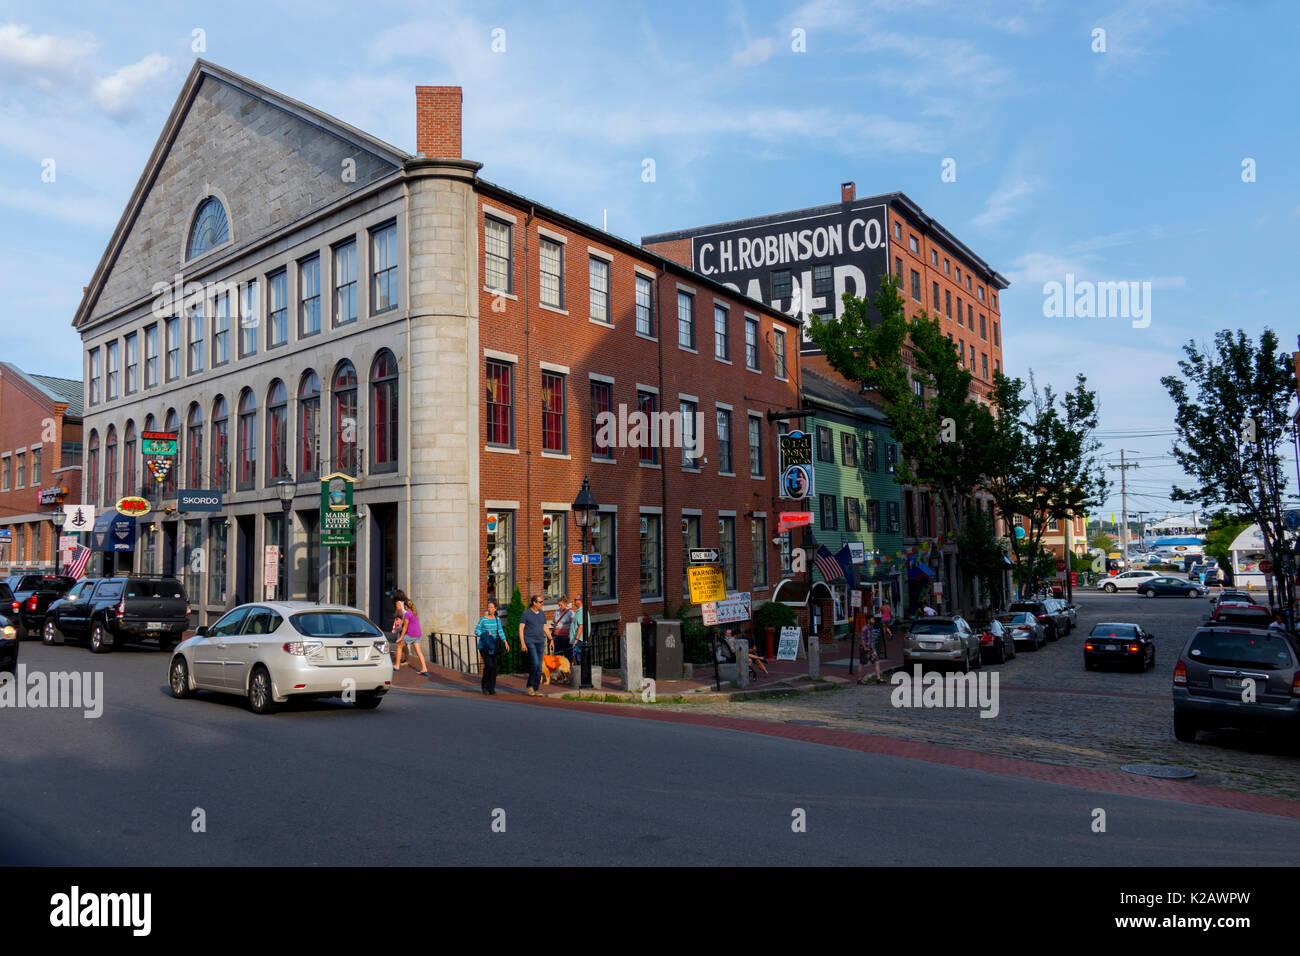 usa-maine-me-portland-fore-street-in-old-downtown-portland-city-shops-K2AWPW.jpg